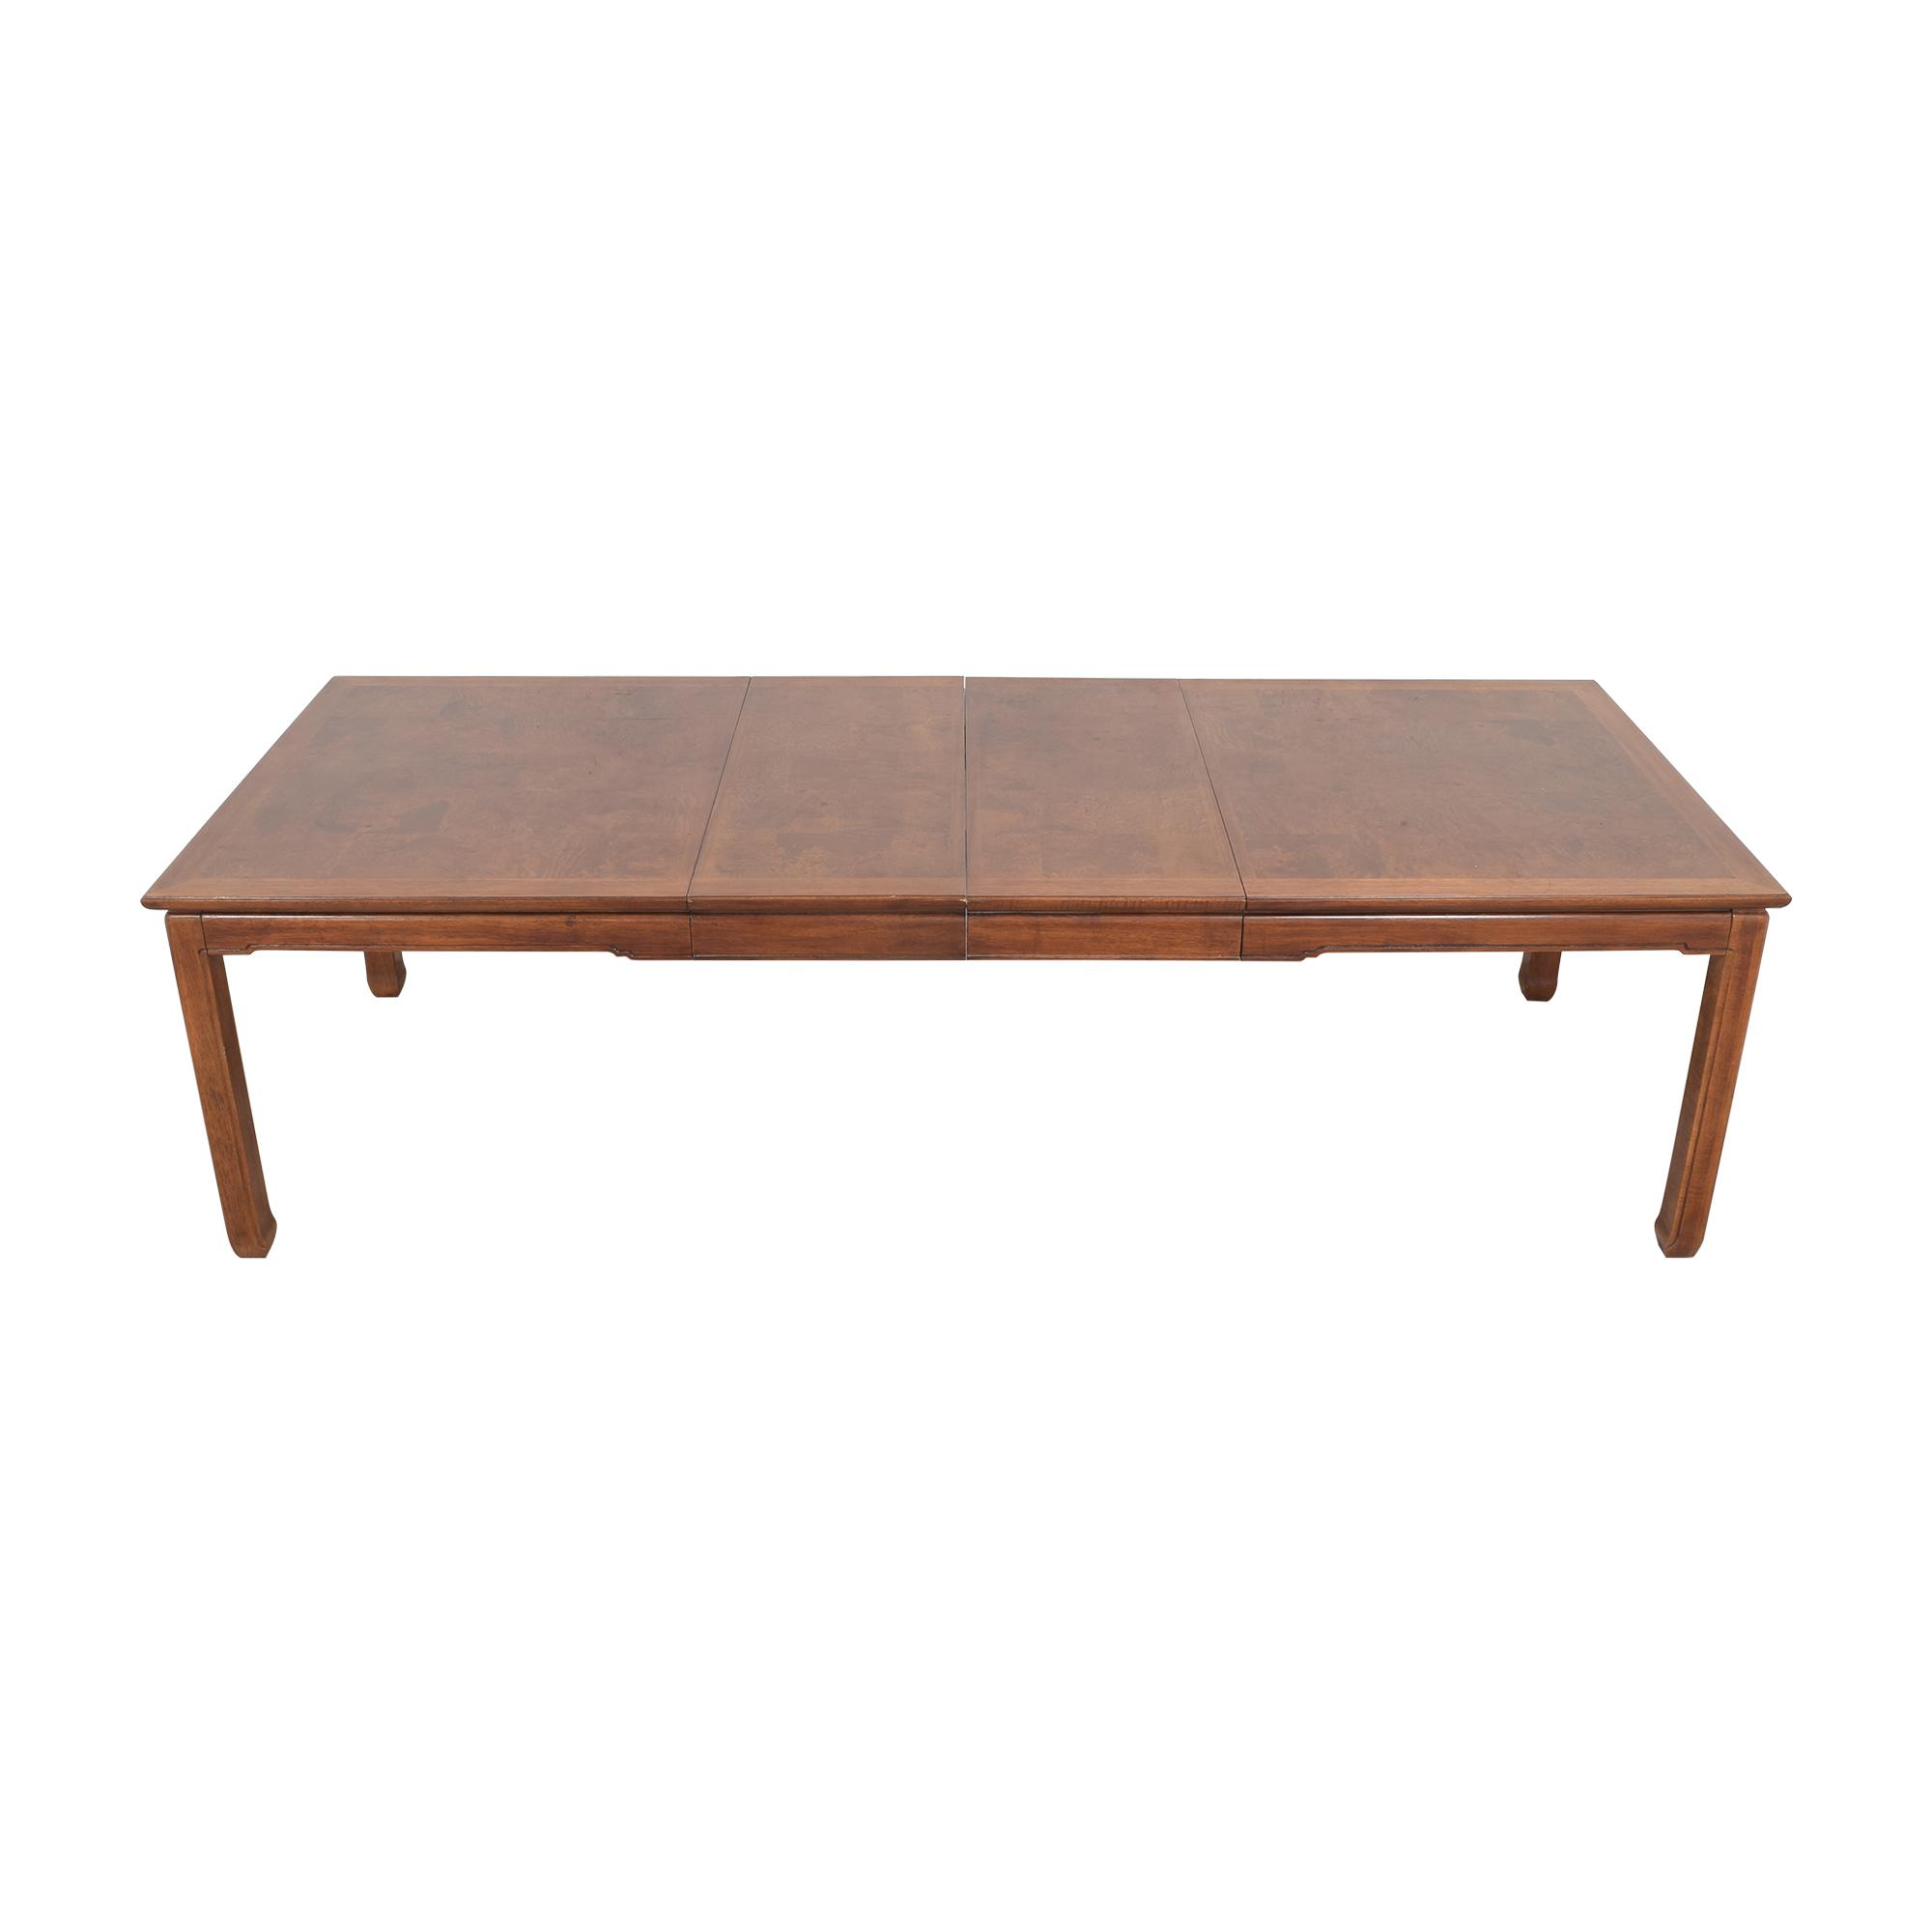 Thomasville Thomasville Mystique Extendable Dining Table on sale